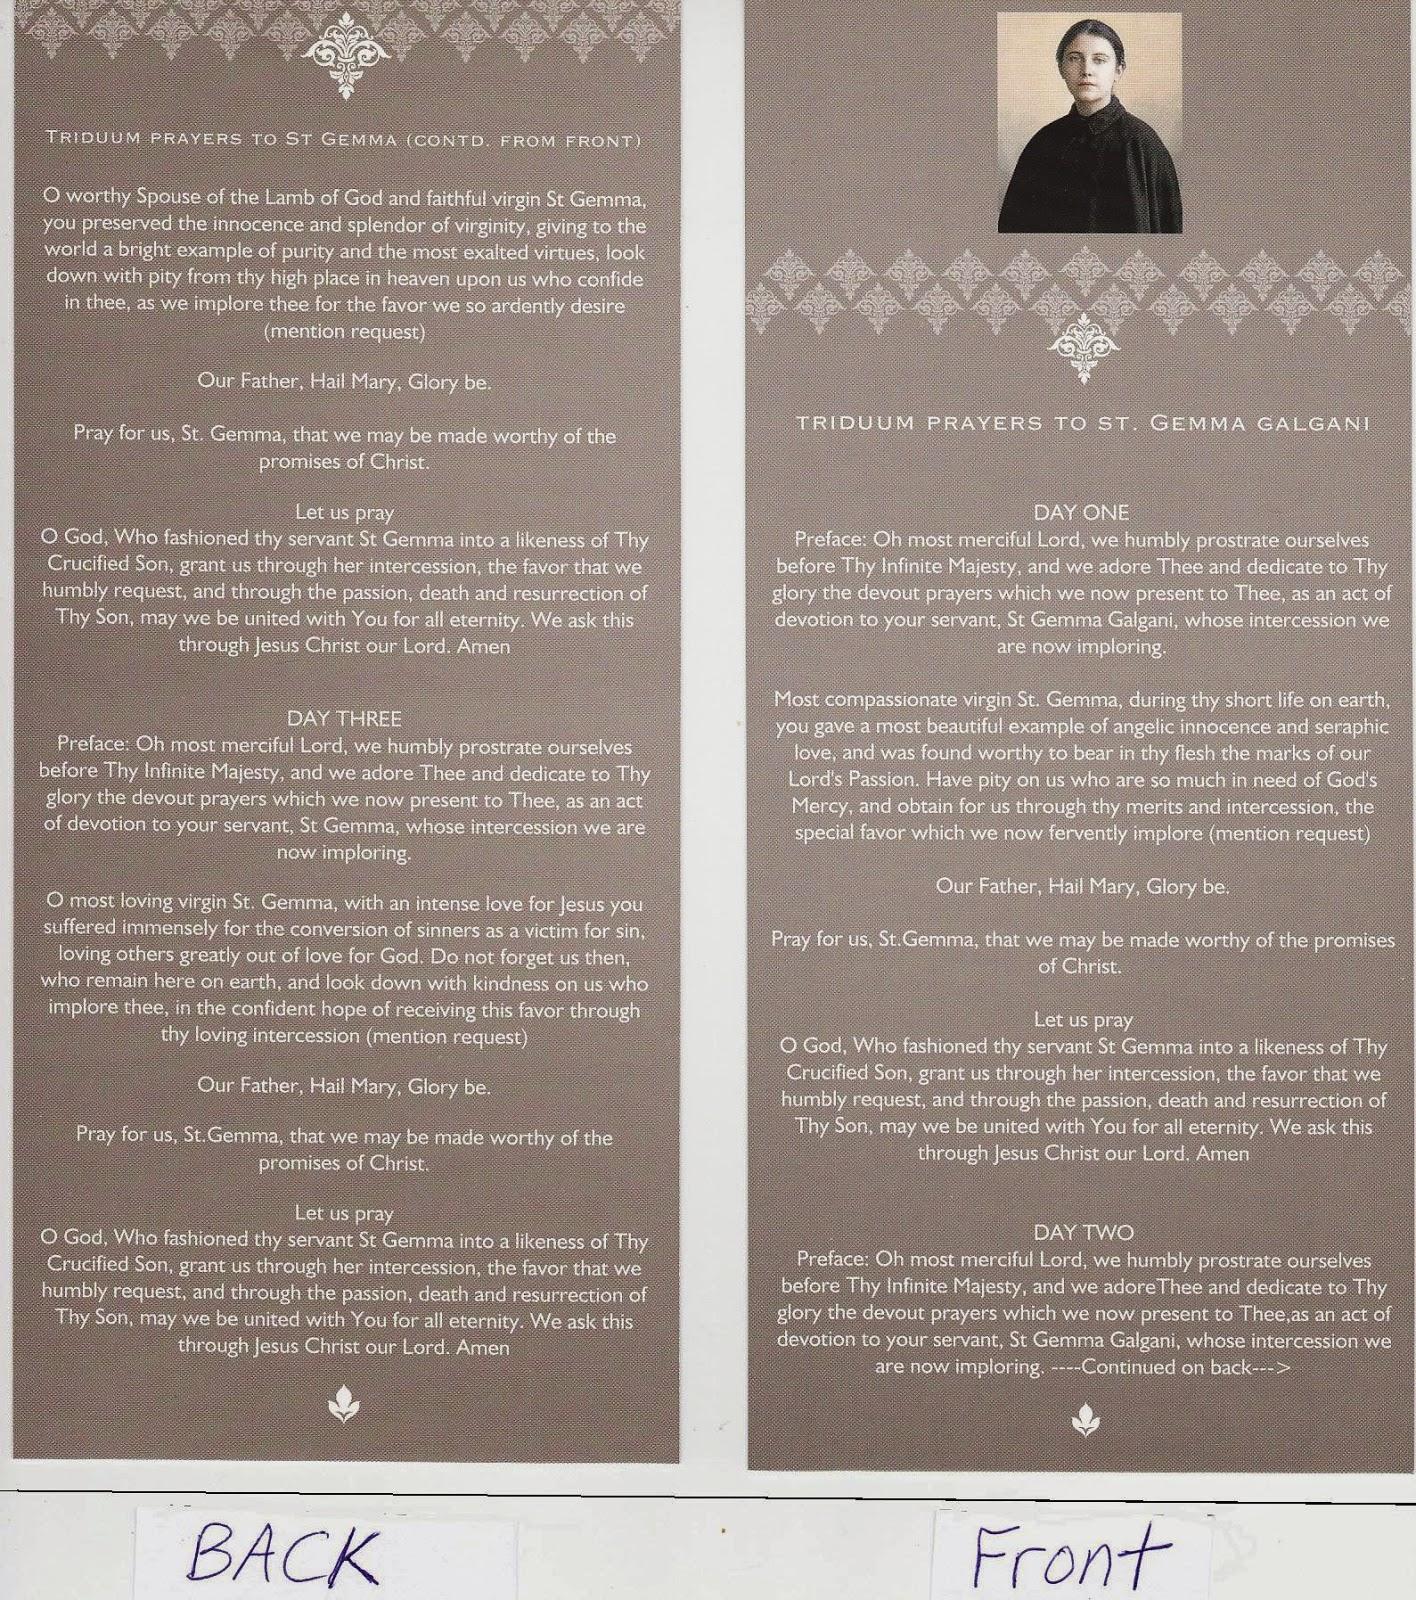 St Gemma Galgani: Prayers and sayings of Saint Gemma Galgani